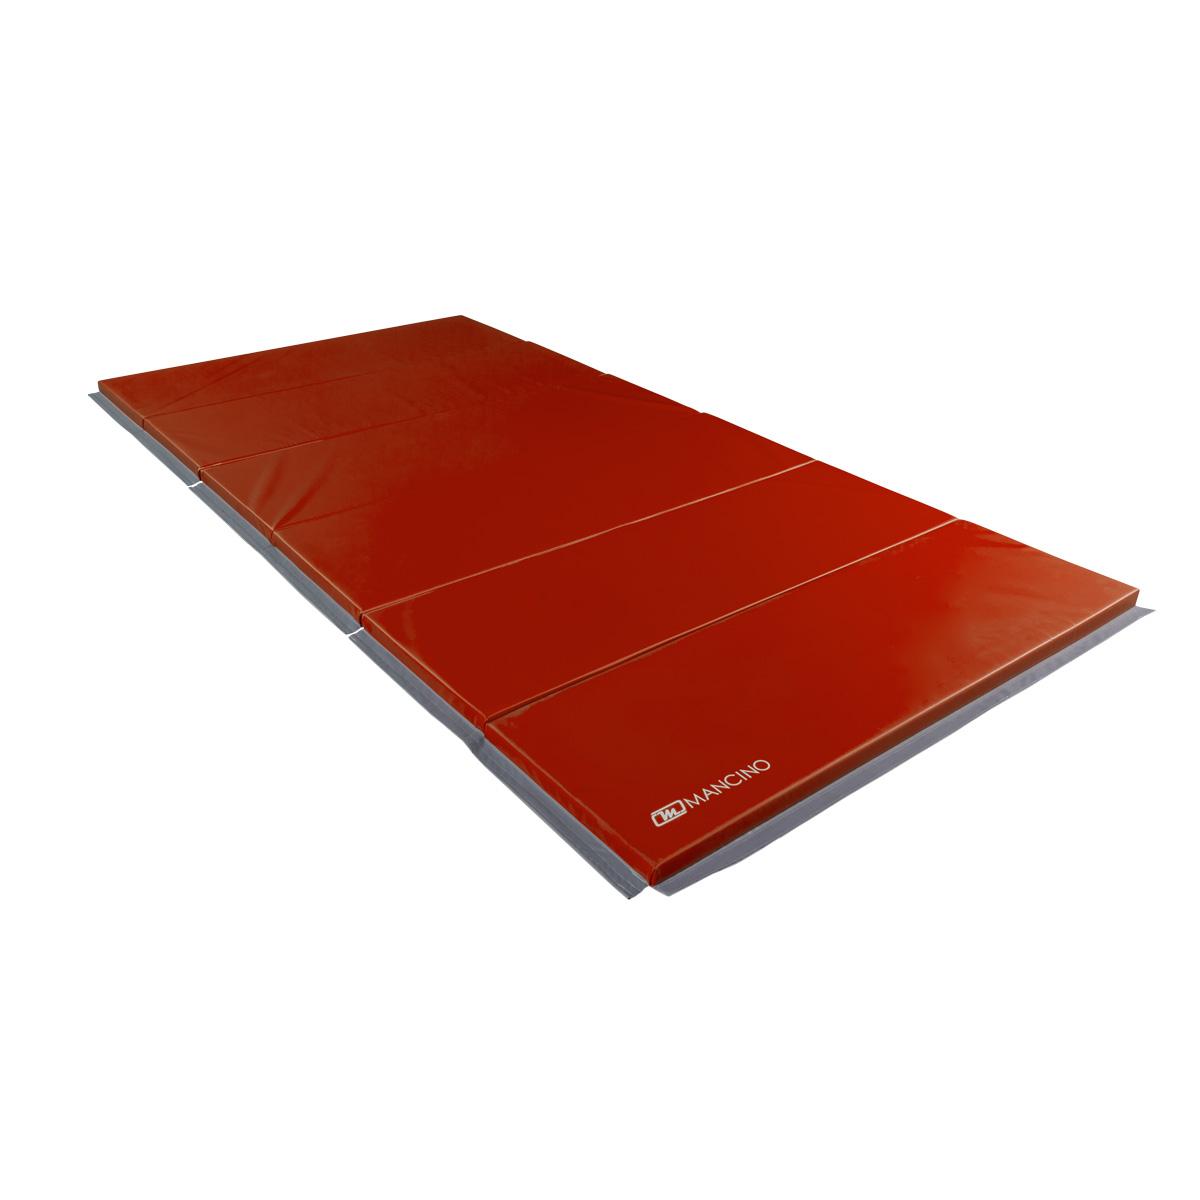 mancino series 200 martial arts mma folding mats